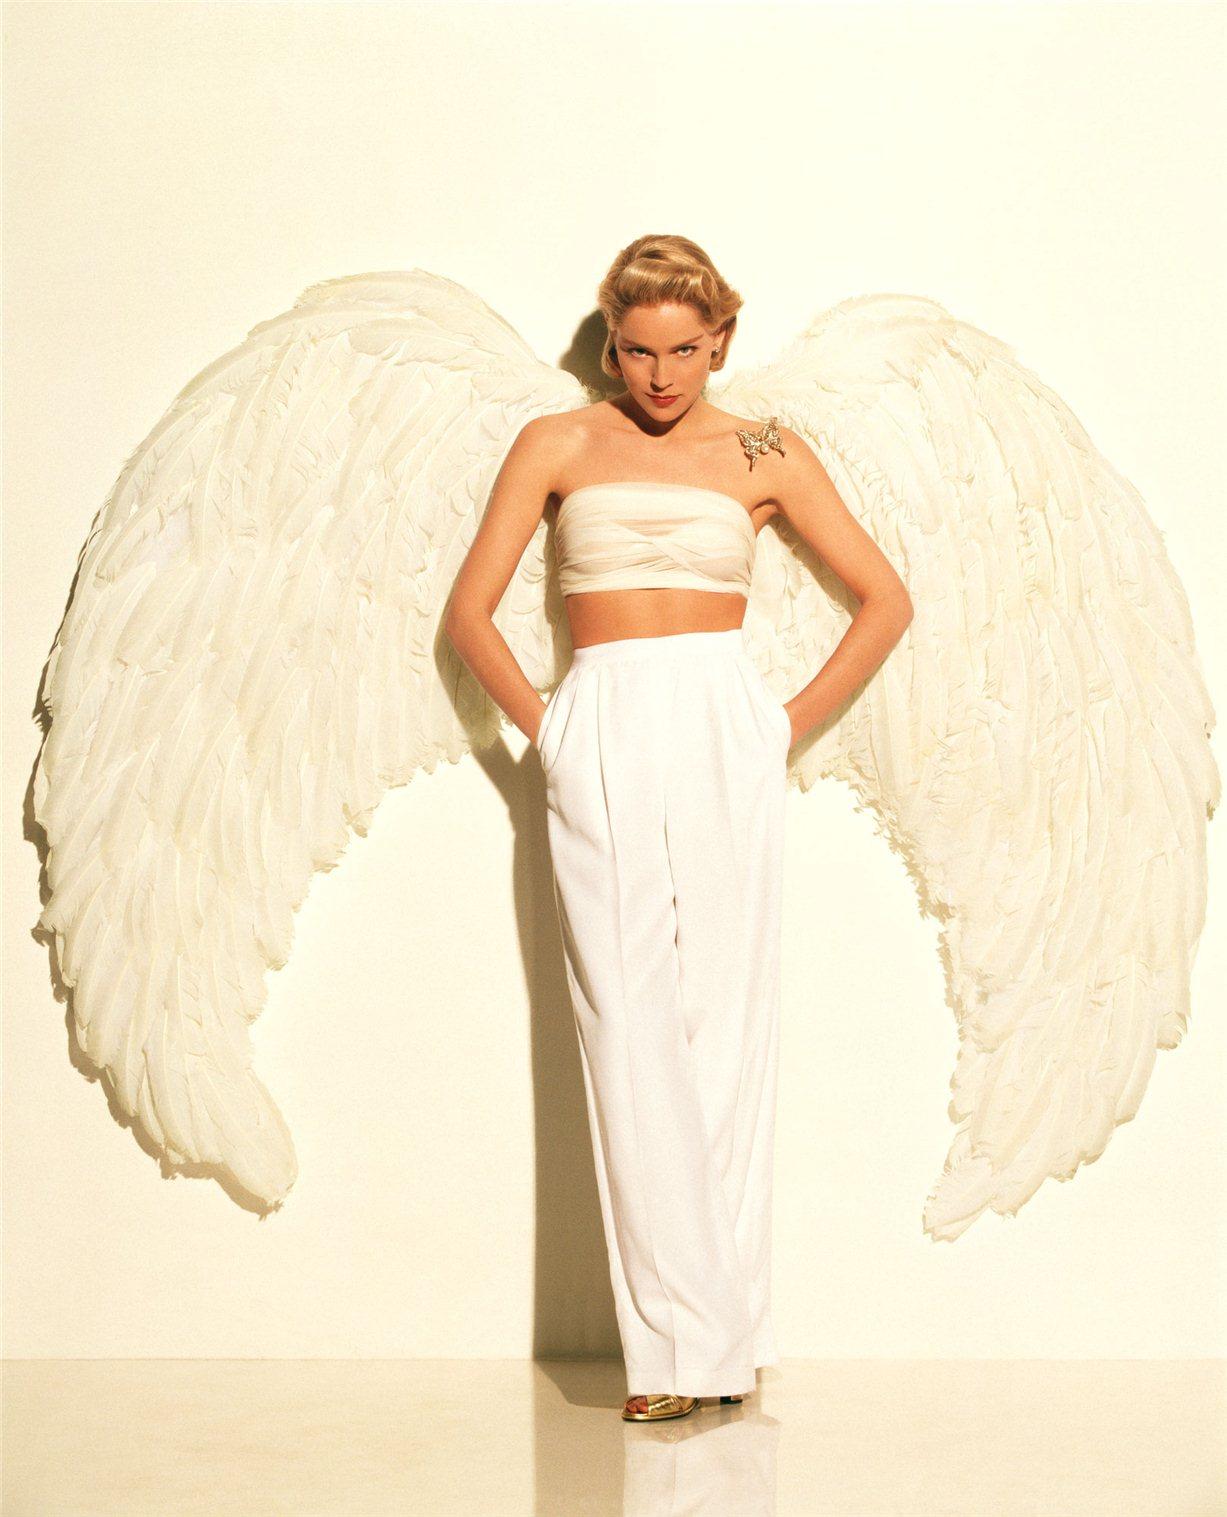 Sharon Stone / Шэрон Стоун - звезды Голливуда, фотограф Firooz Zahedi